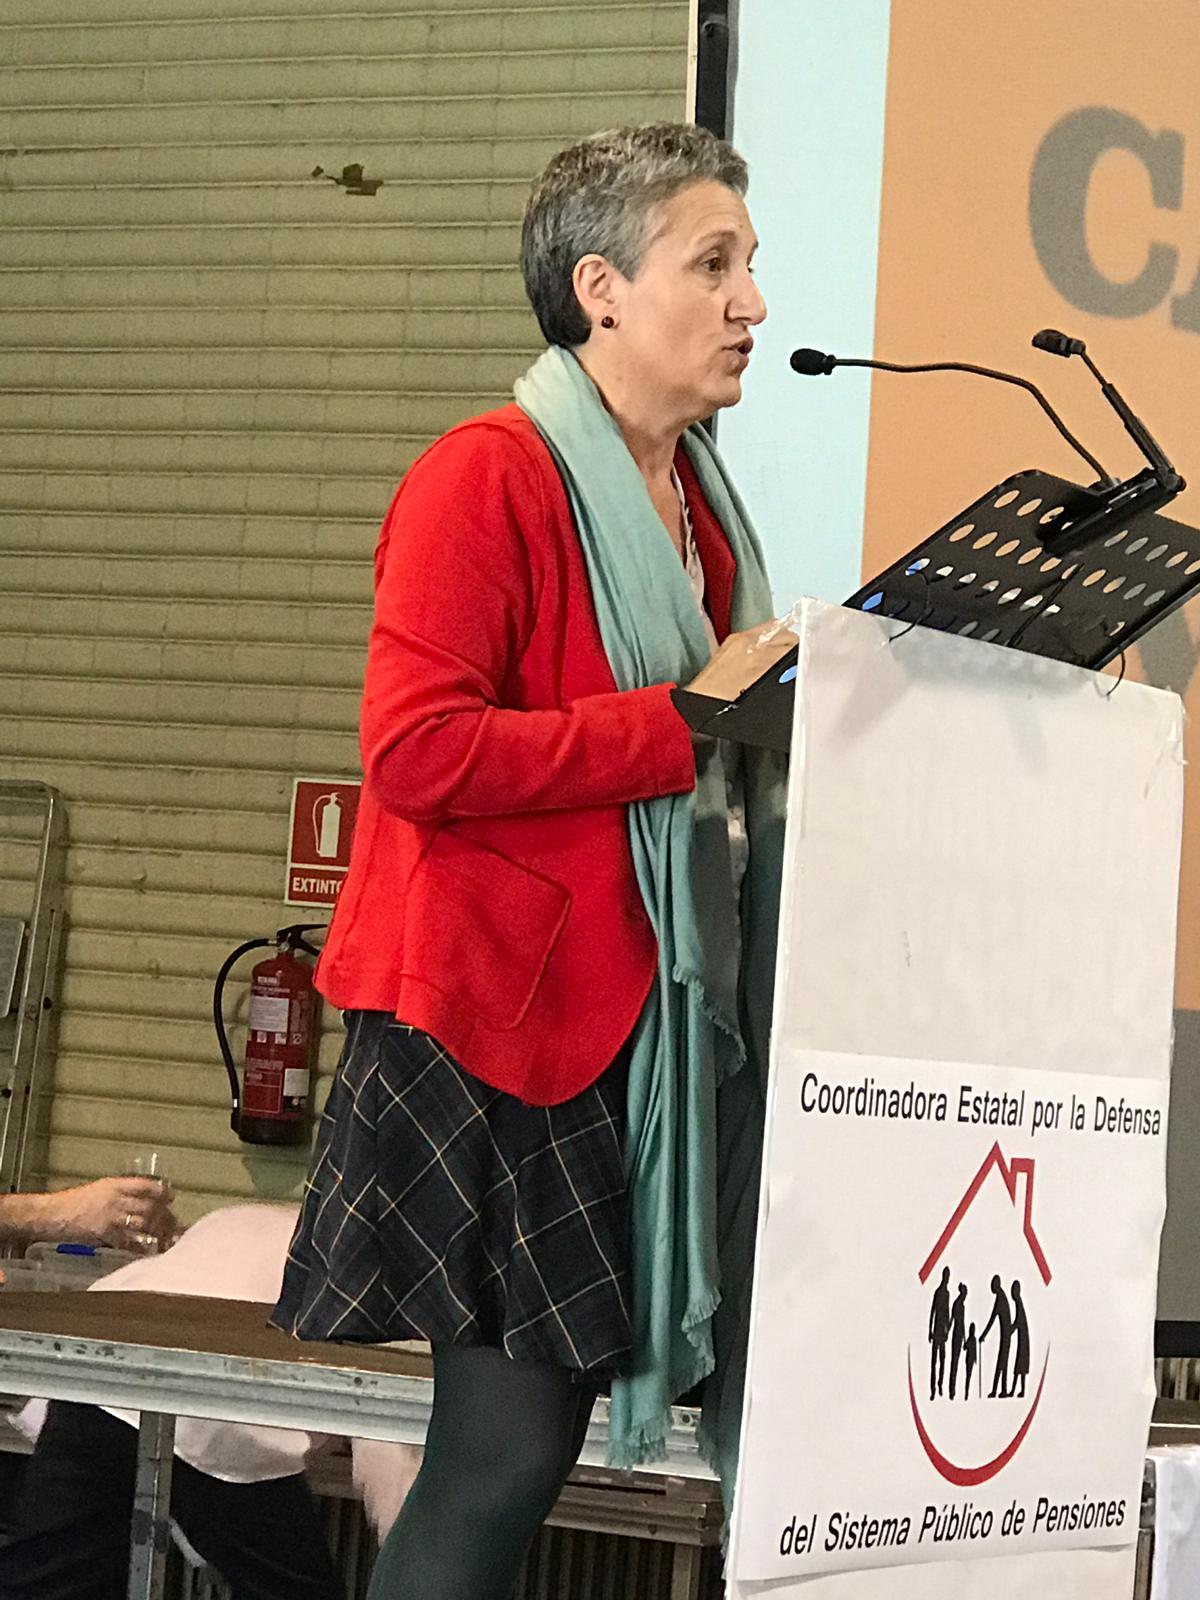 Lidia Senra, intervindo no acto sobre pensions en Barcelona